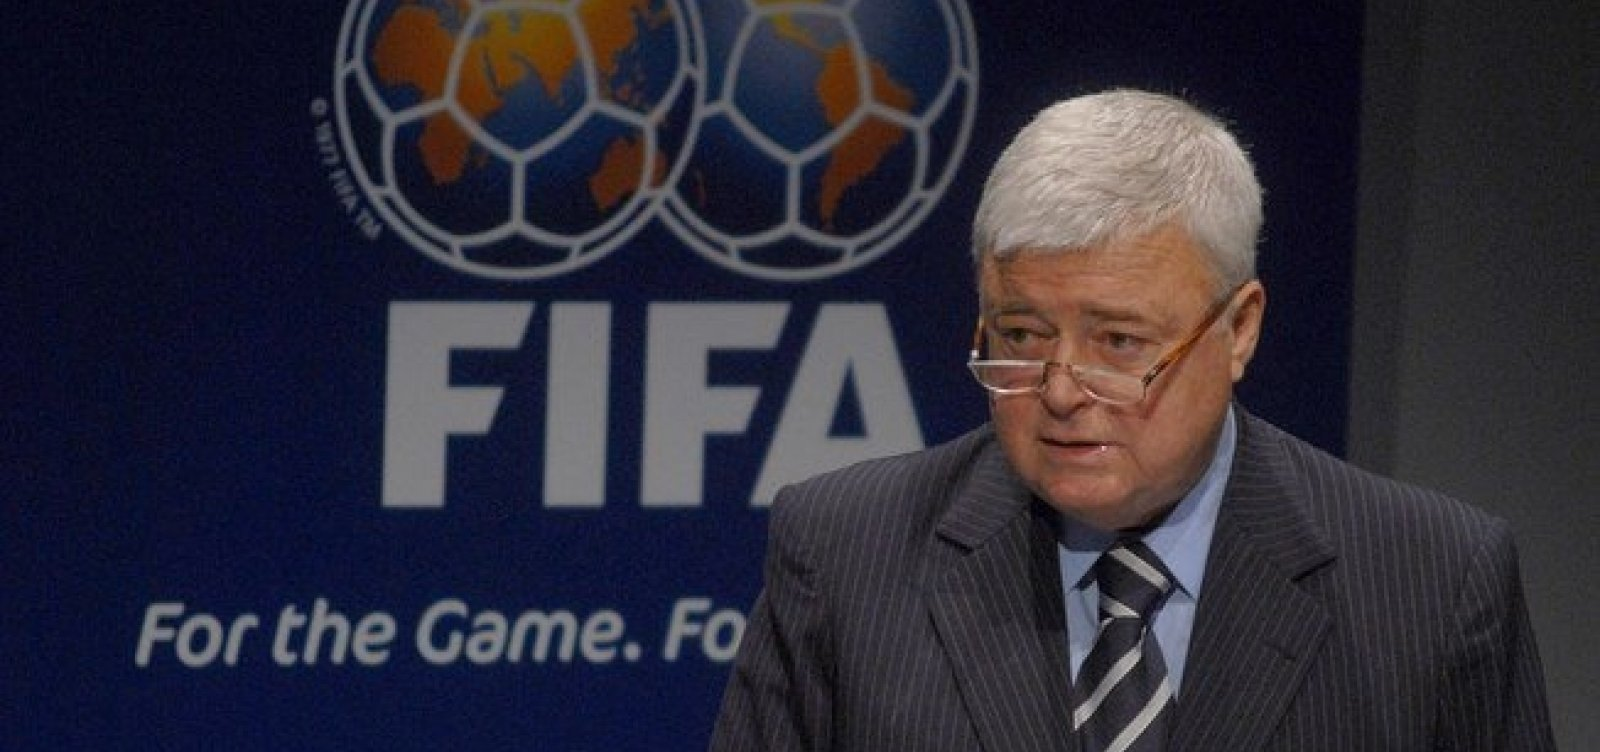 Fifa anuncia banimento perpétuo no futebol de ex-presidente da CBF Ricardo Teixeira